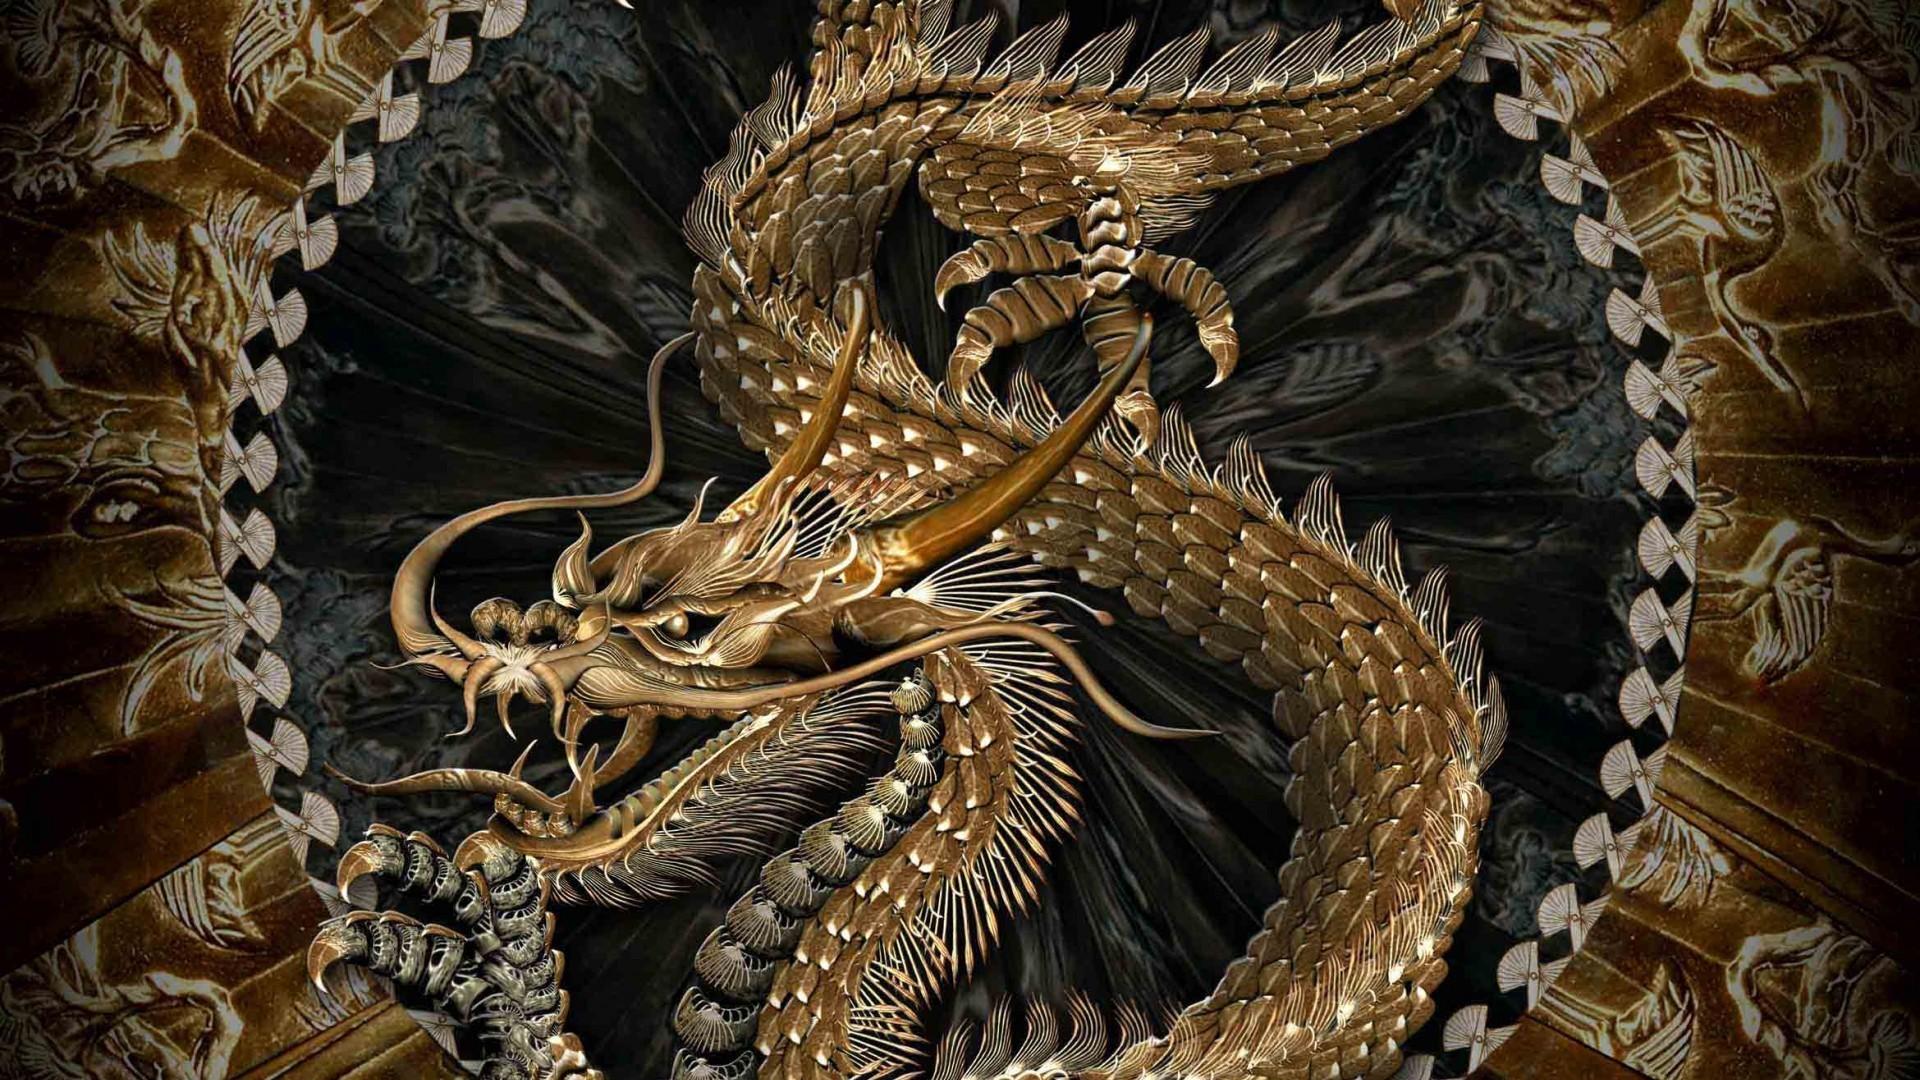 Dragon IPhone Wallpapers Pack Dragon Wallpaper IPhone   HD Wallpapers    Pinterest   Japanese dragon, Dragons and Wallpaper